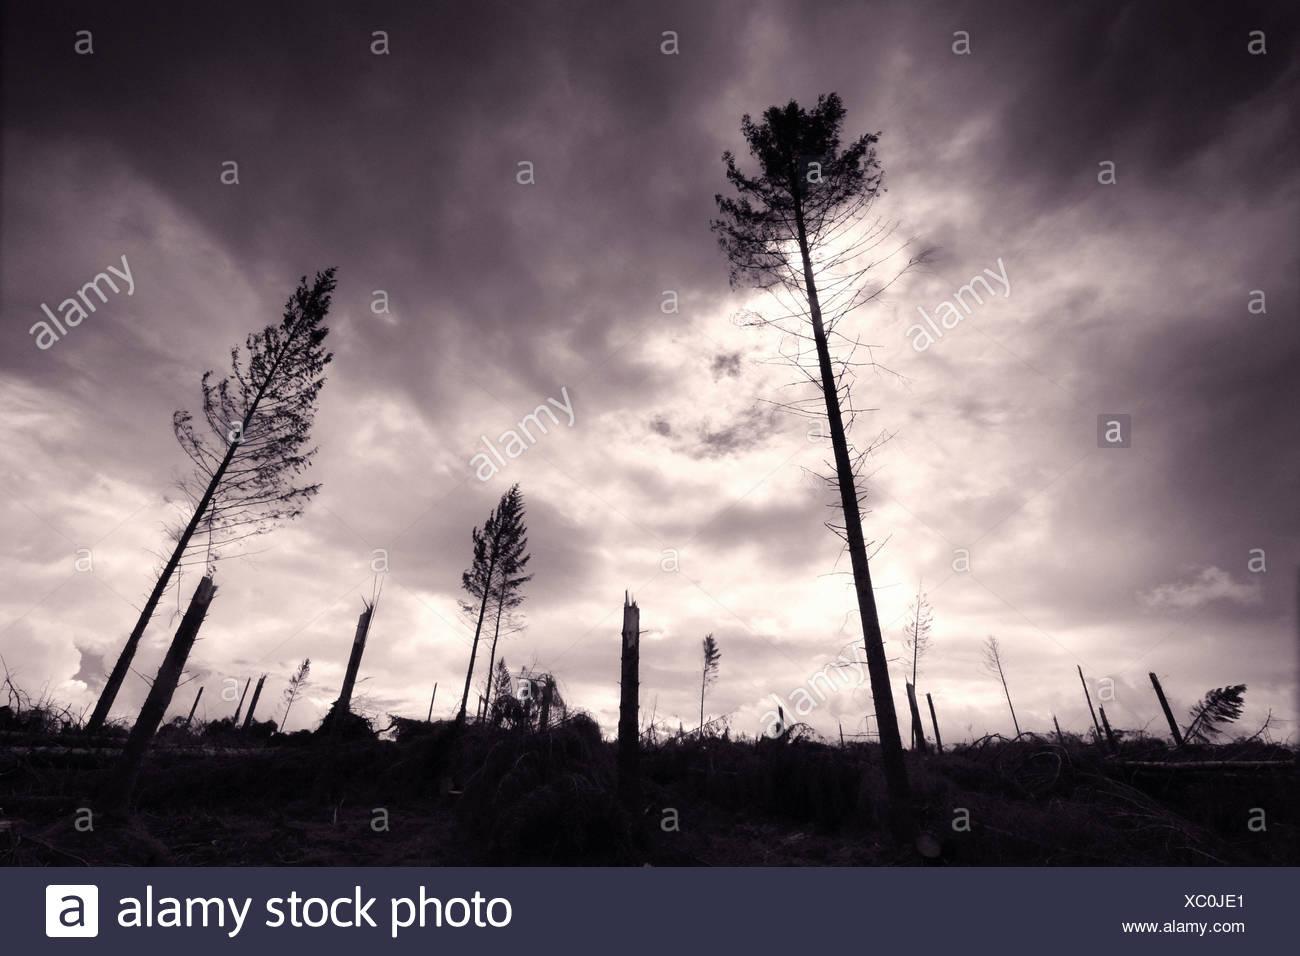 logging - Stock Image